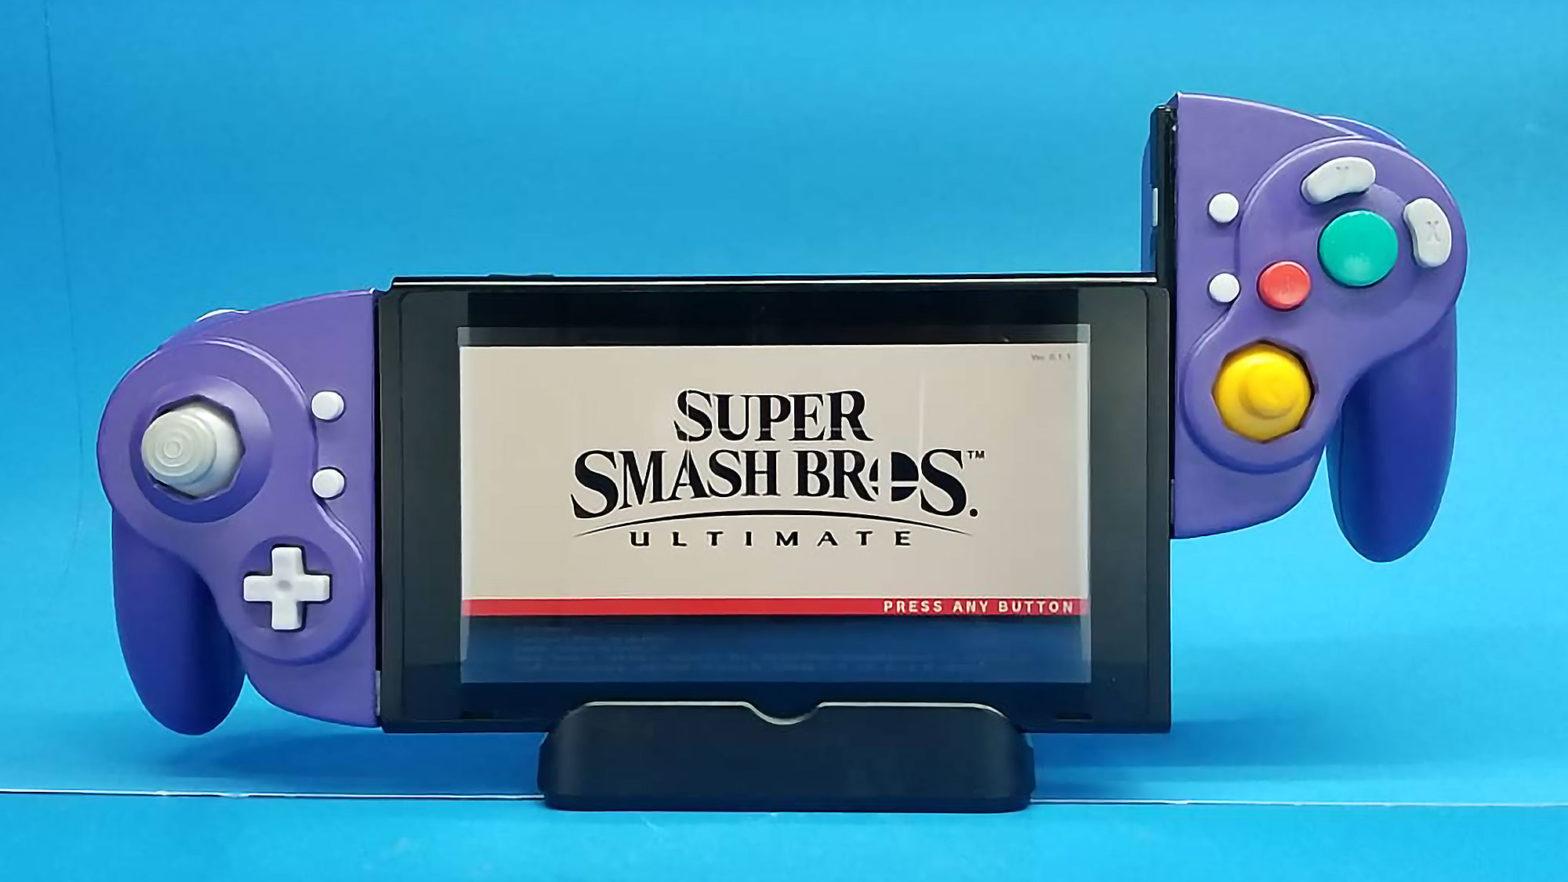 GameCube Joy-Cons Mod For Nintendo Switch